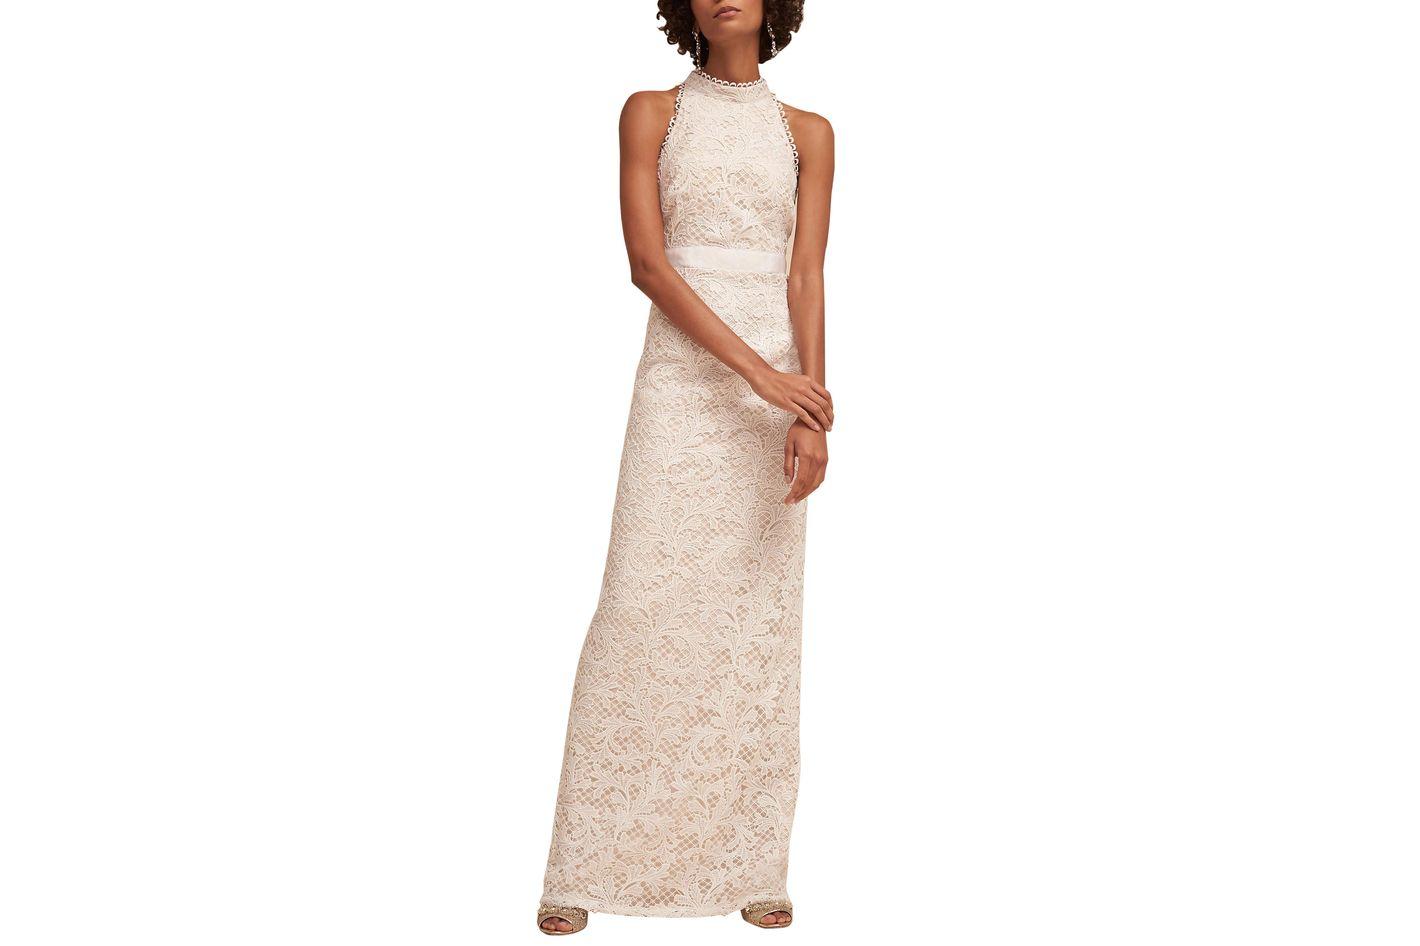 BHDLN Waltz Dress